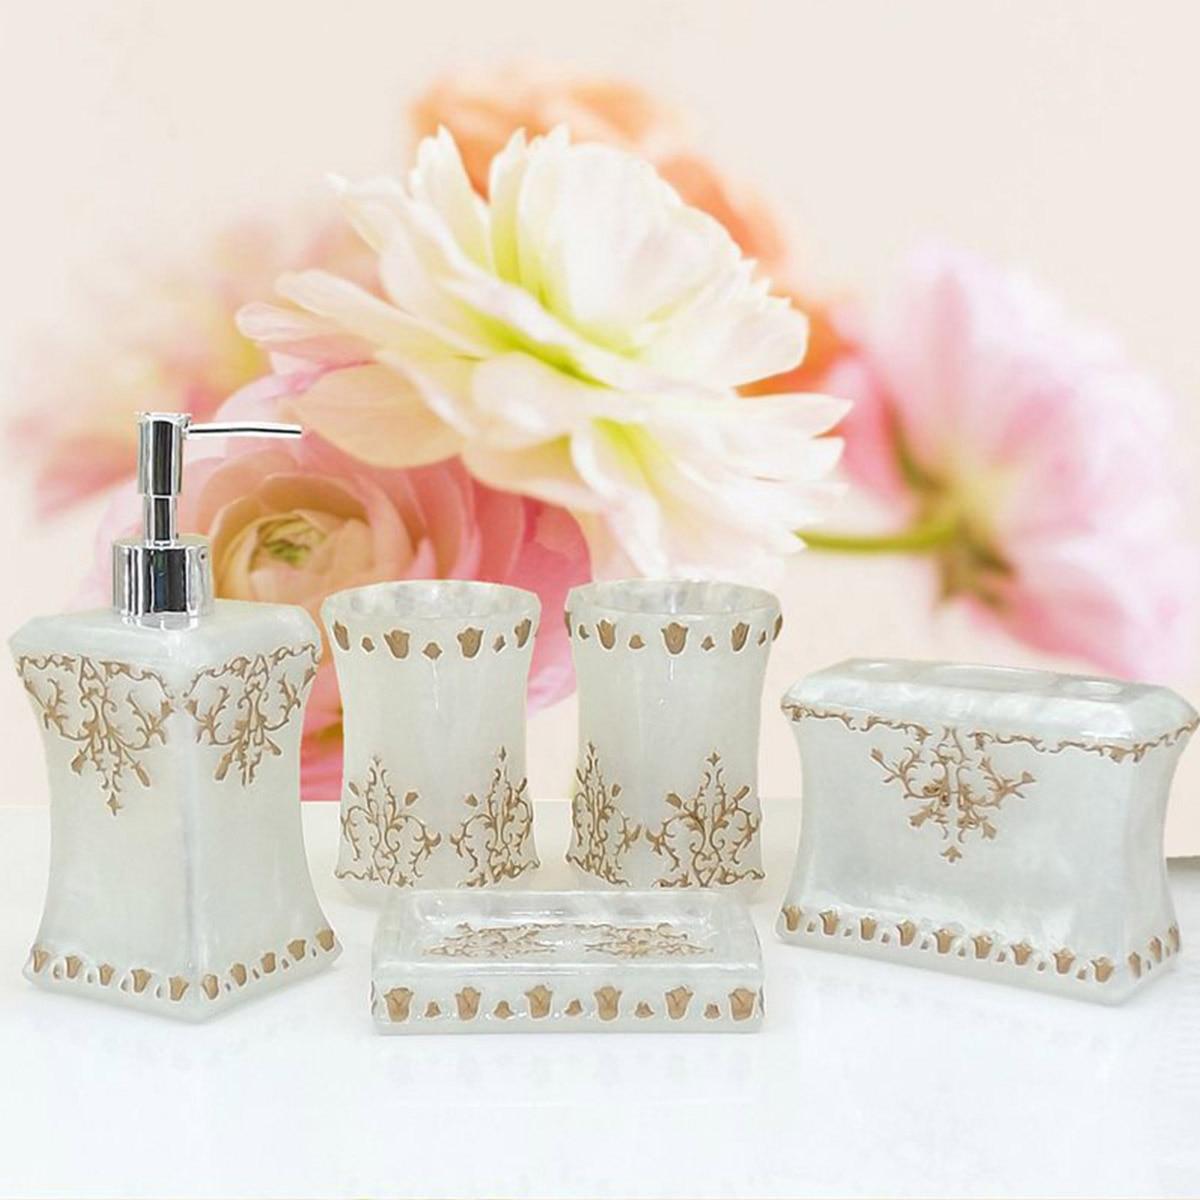 New 5PCS Resin Bathroom Accessories Set Pearl Floral